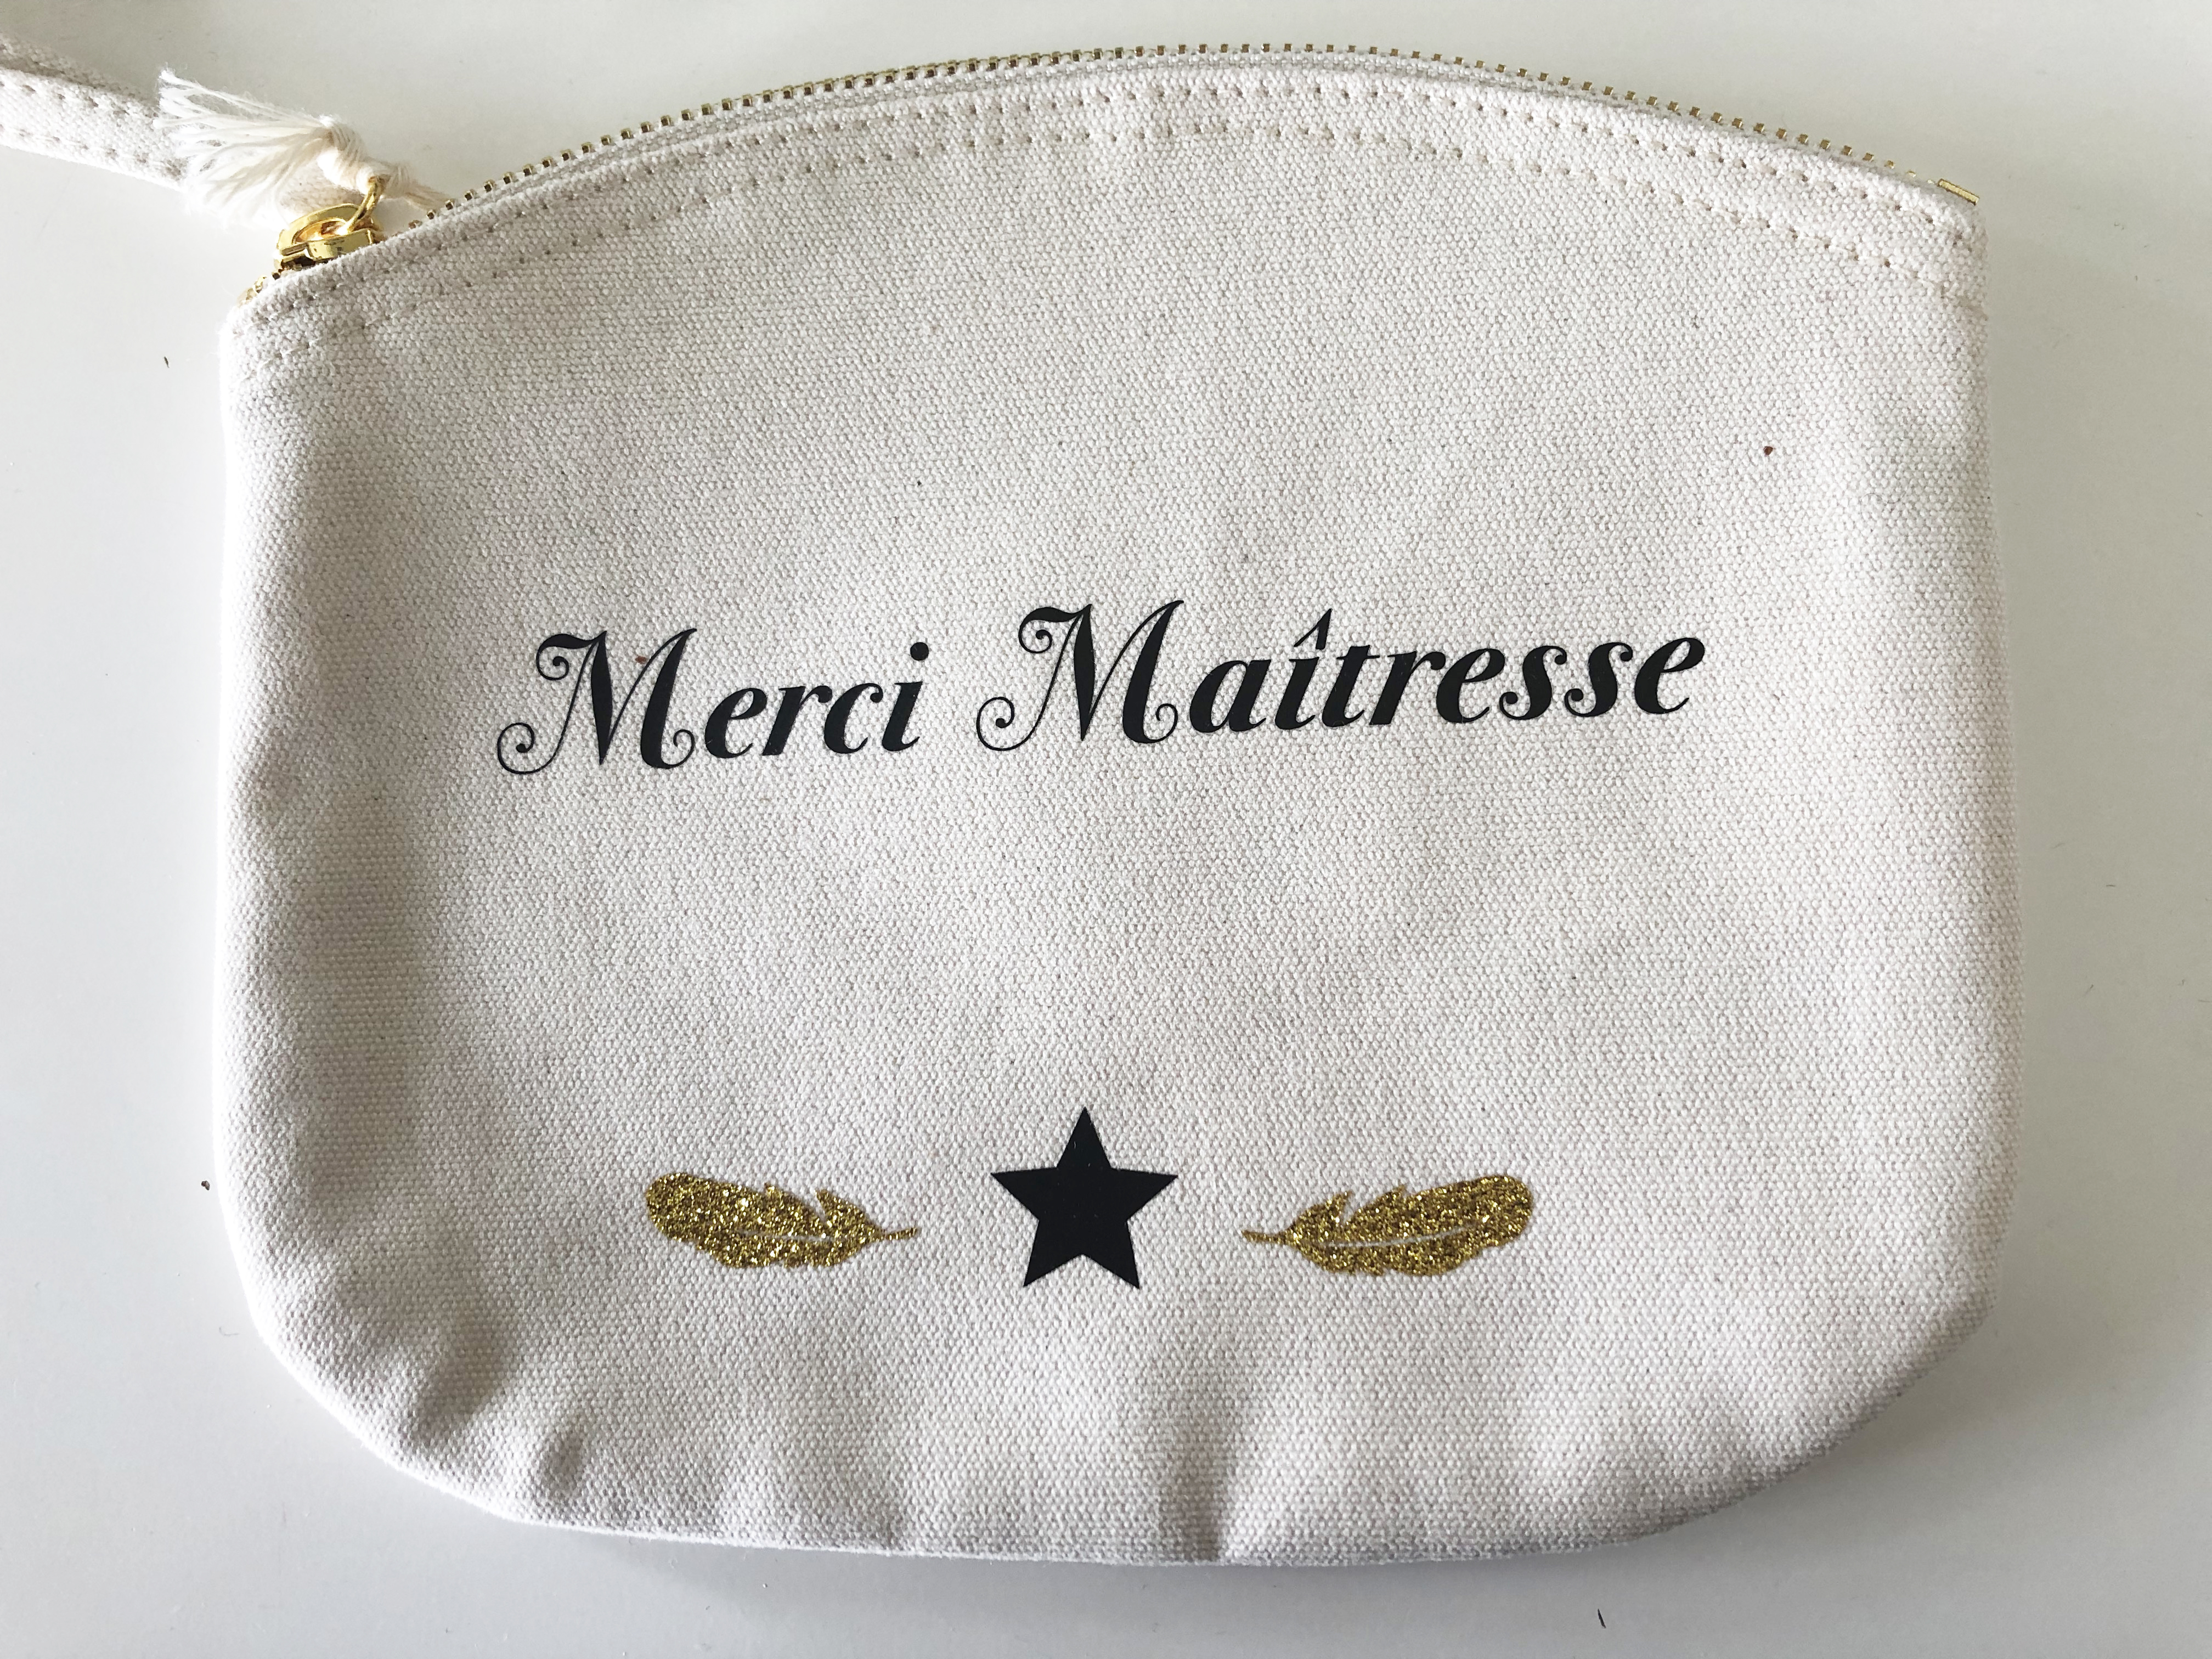 Cadeau maitresse- TrousseBeigeMerciMaitresse2